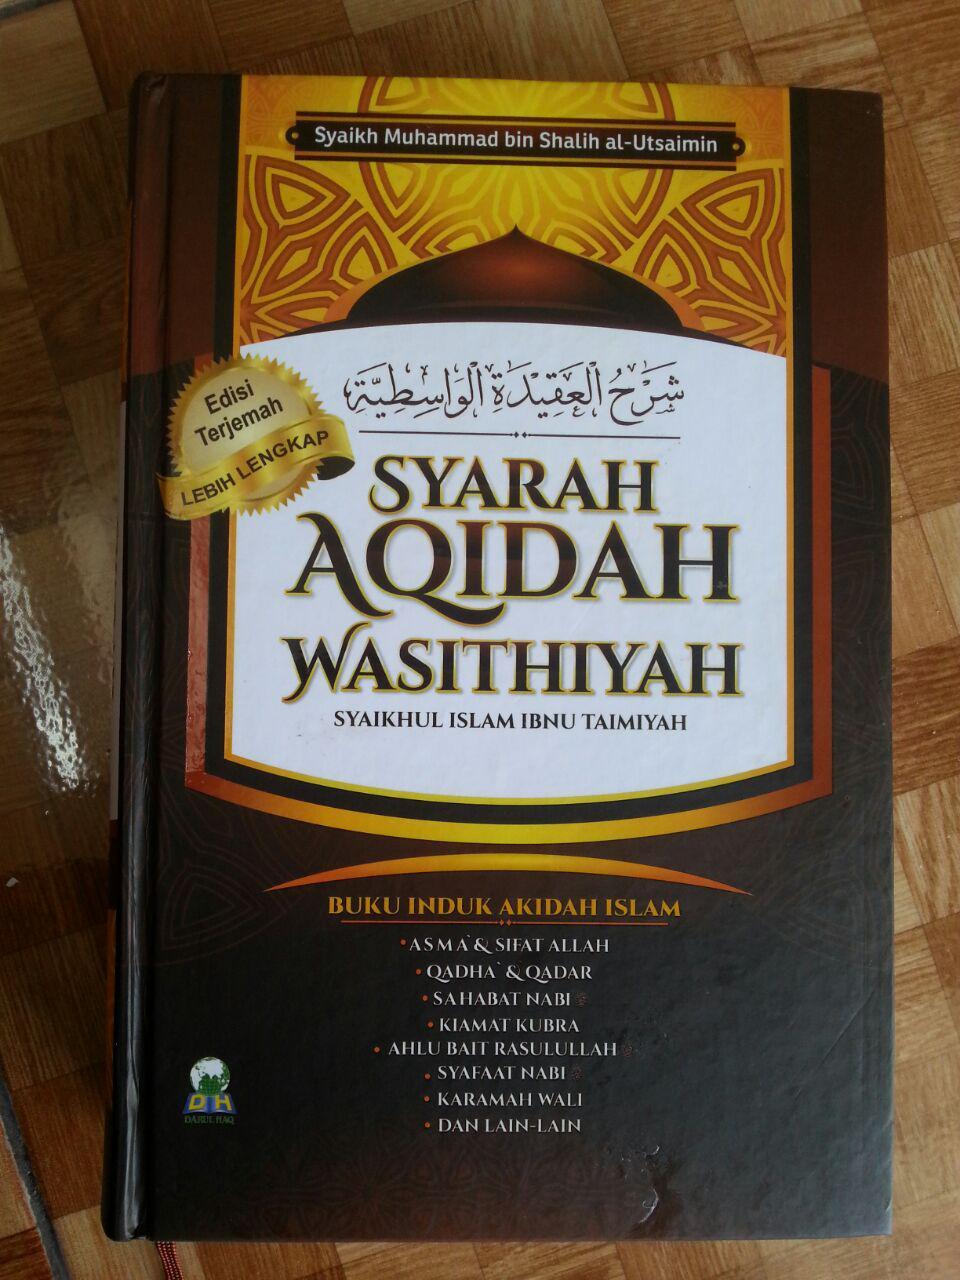 Buku Syarah Aqidah Wasithiyah Induk Akidah Islam cover